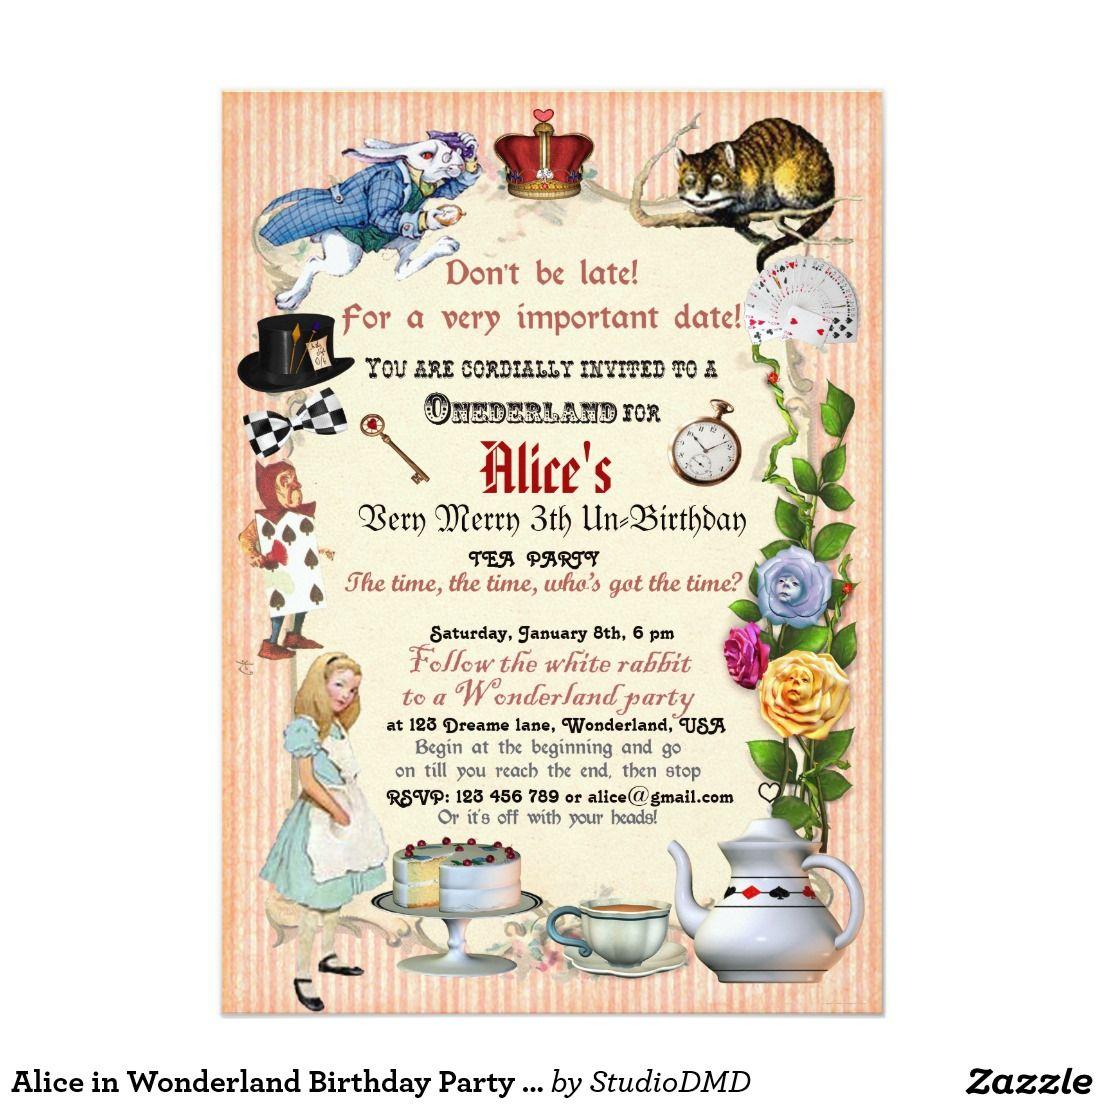 Alice in Wonderland Birthday Party Invitation   Party invitations ...